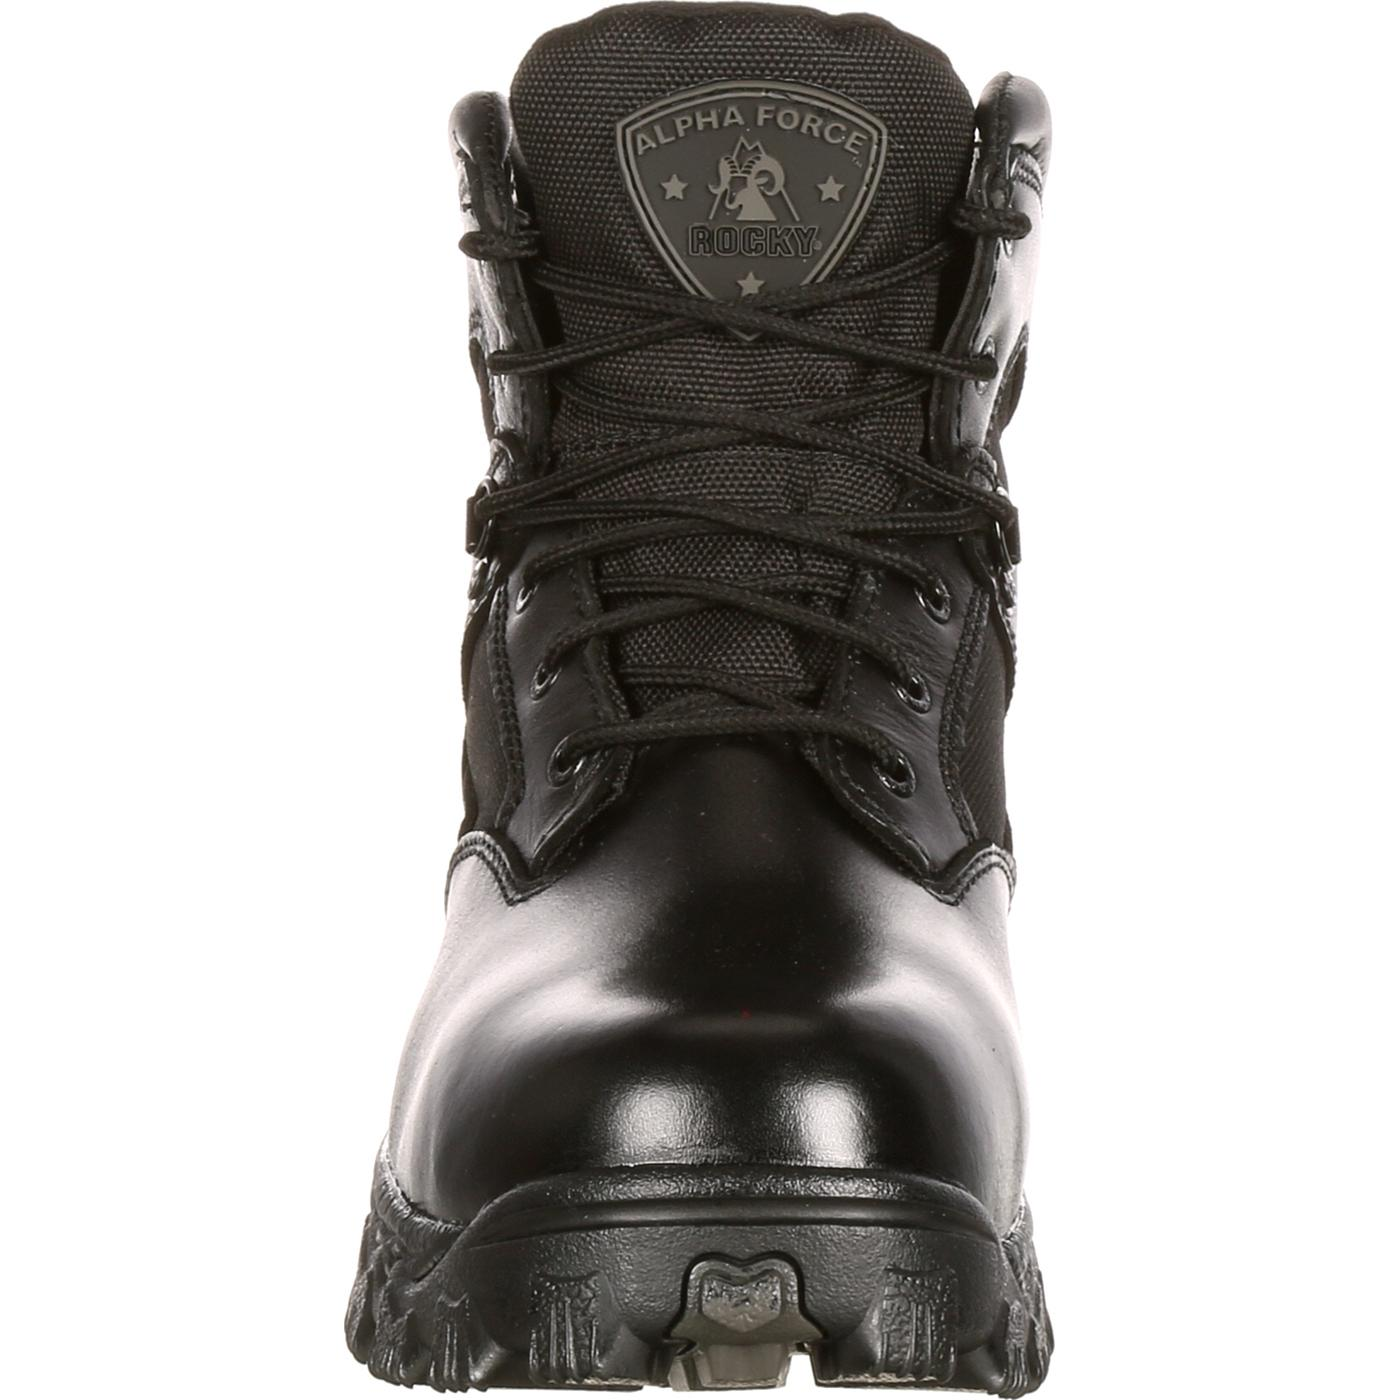 aacbd76cba5 Rocky Alpha Force Composite Toe Waterproof Public Service Boot